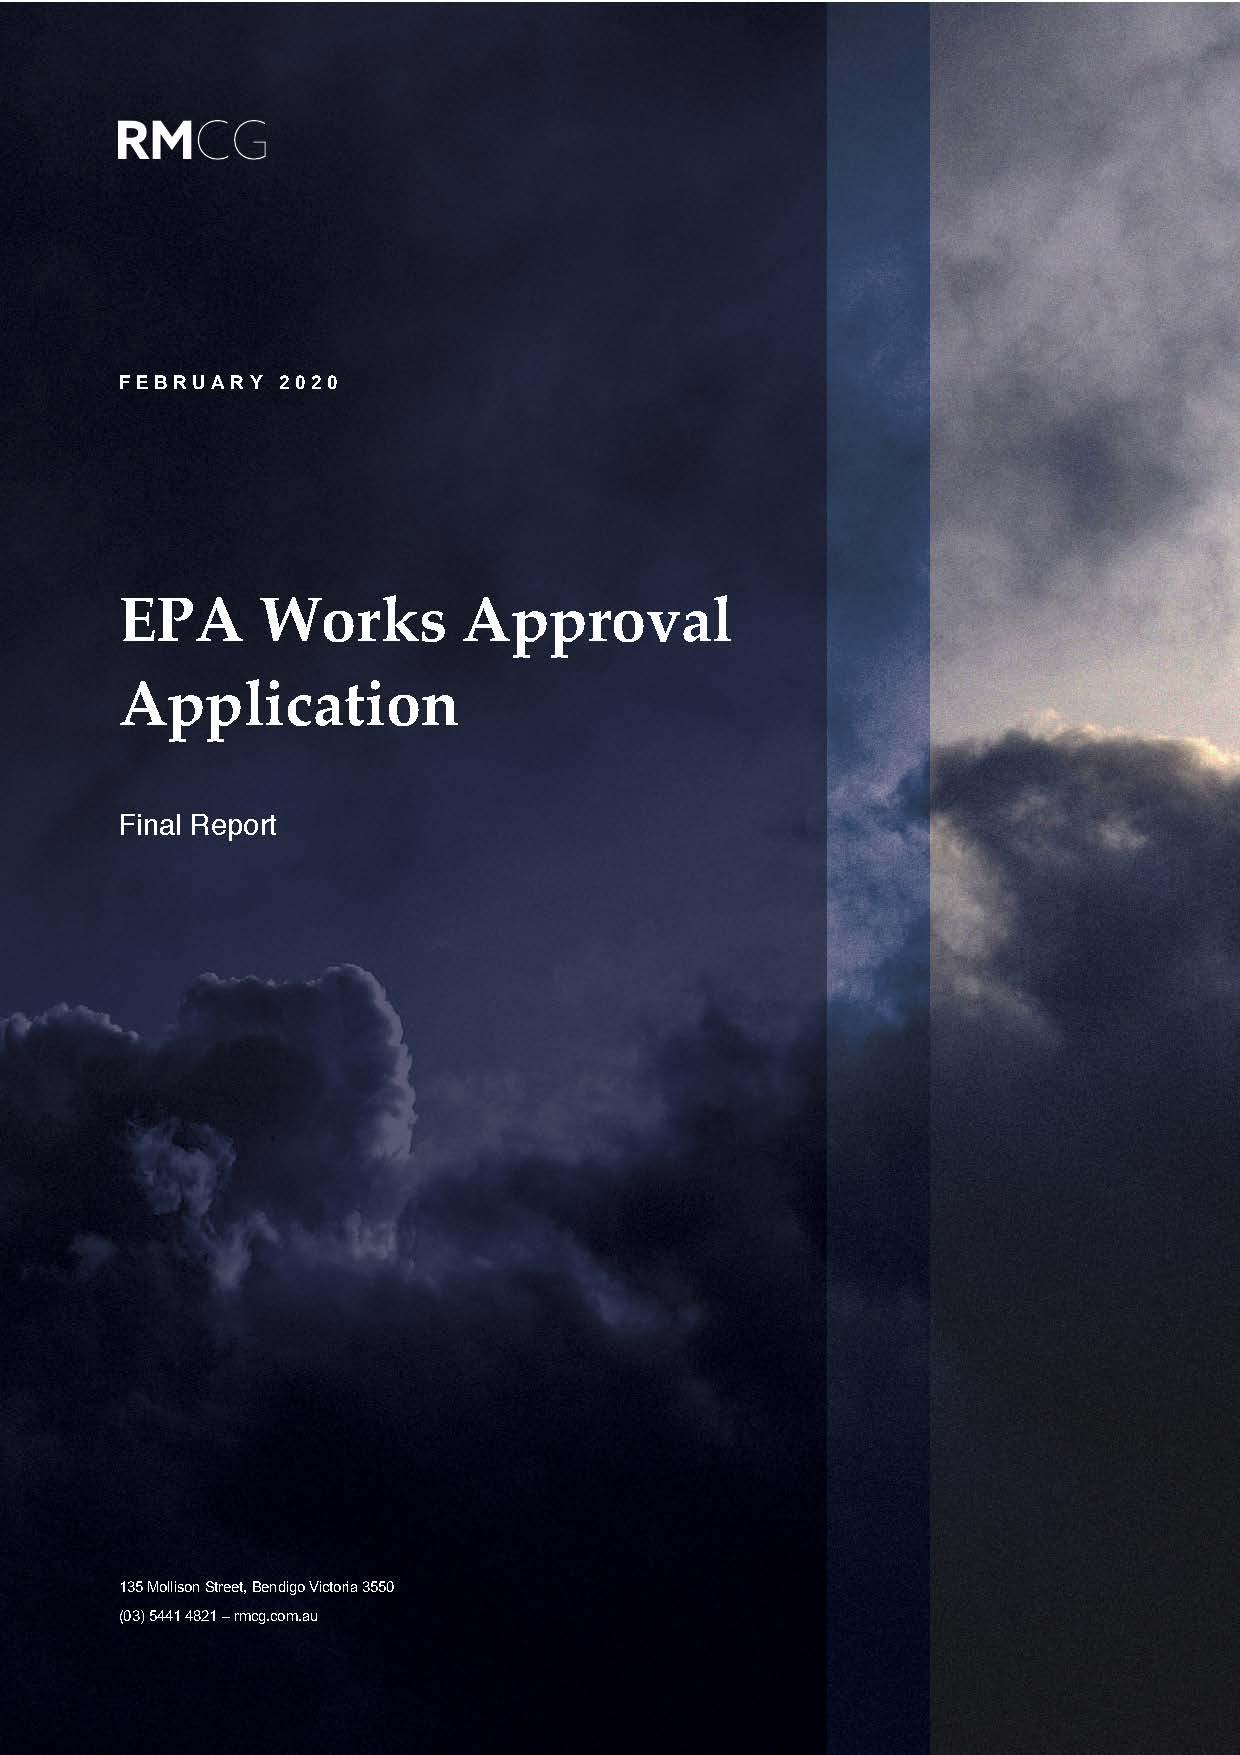 EPA Work Approval Application